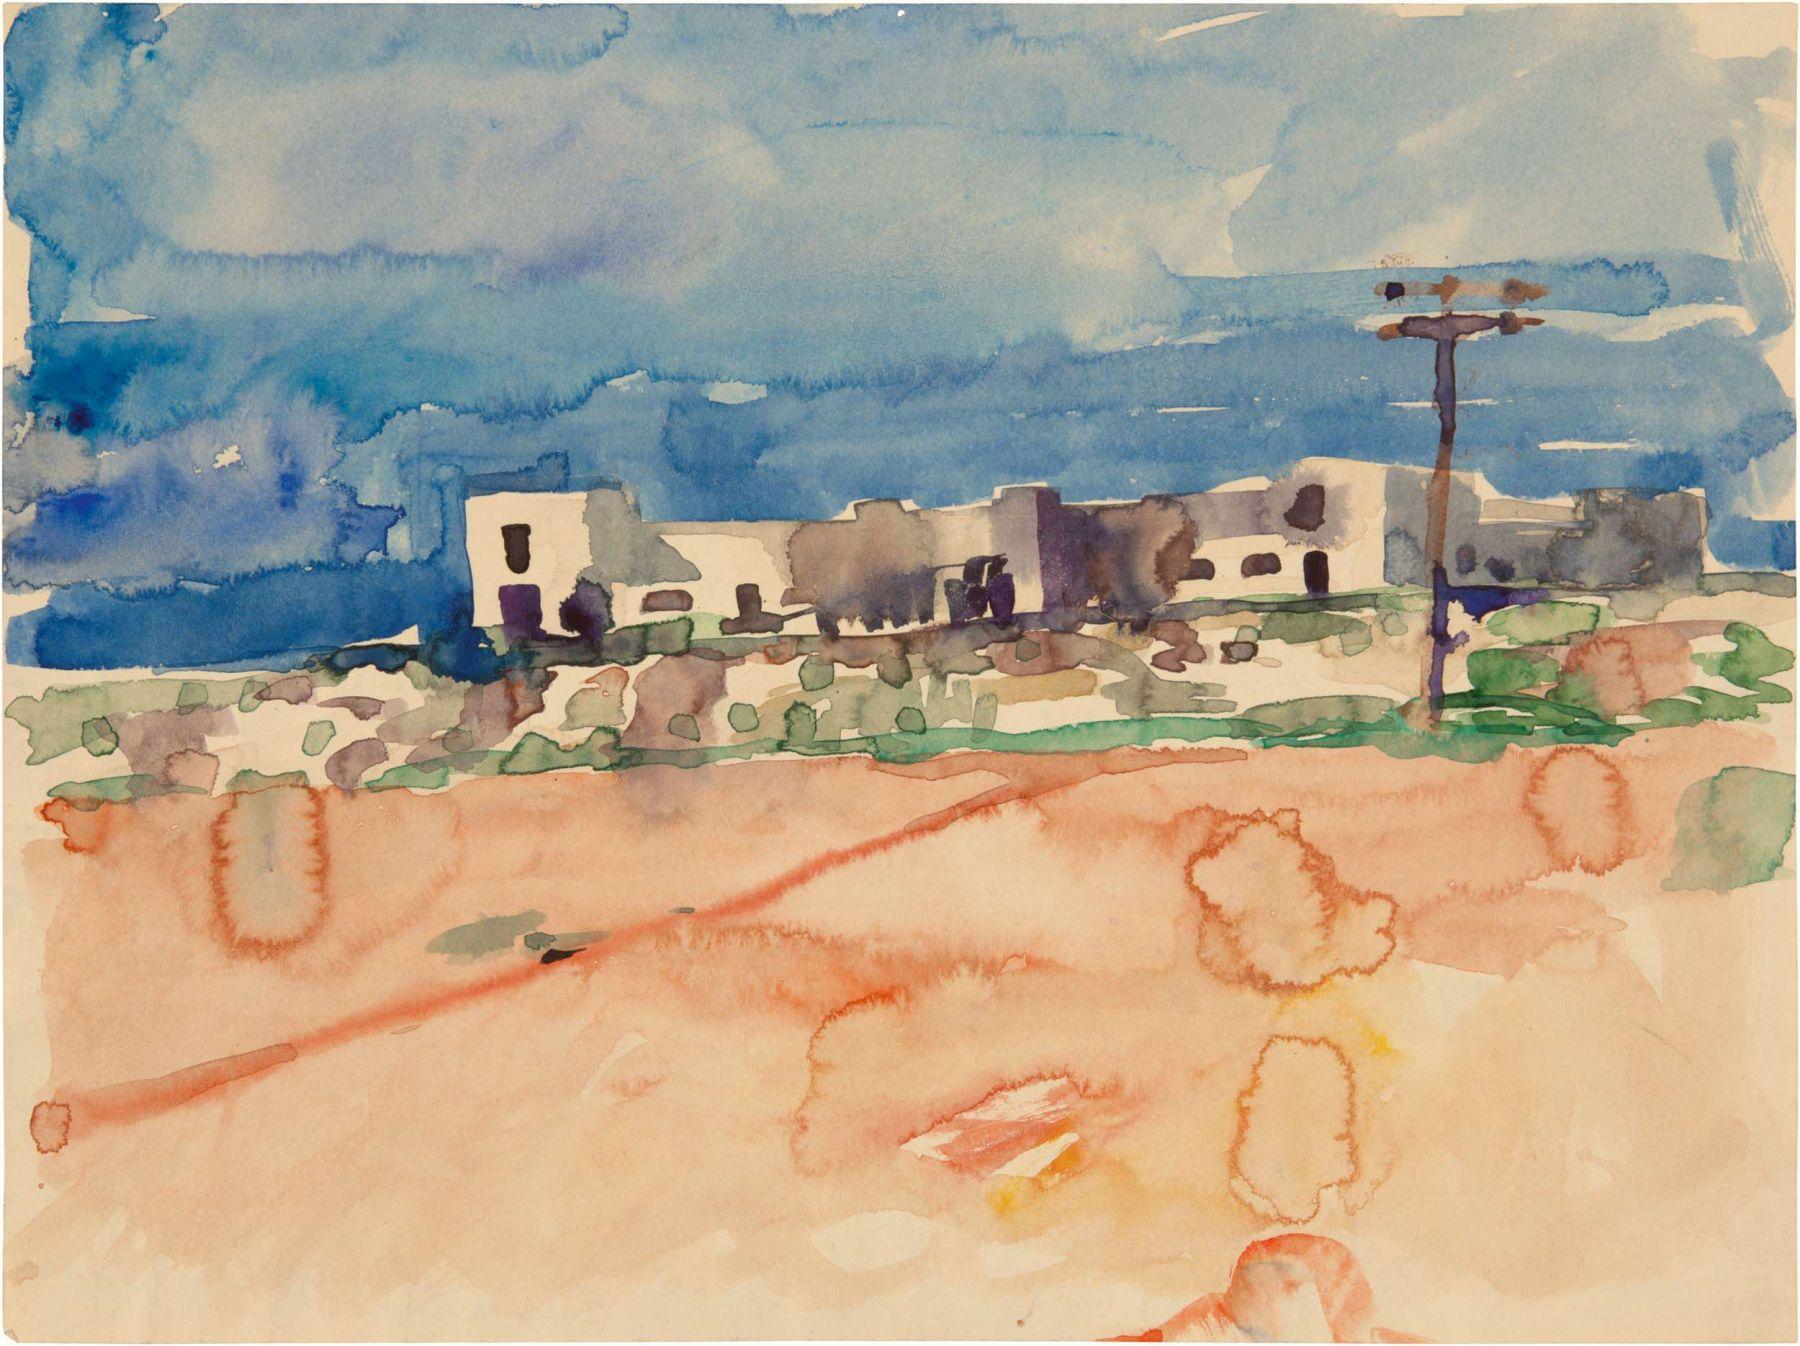 Untitled (CR no. 1333), 1955